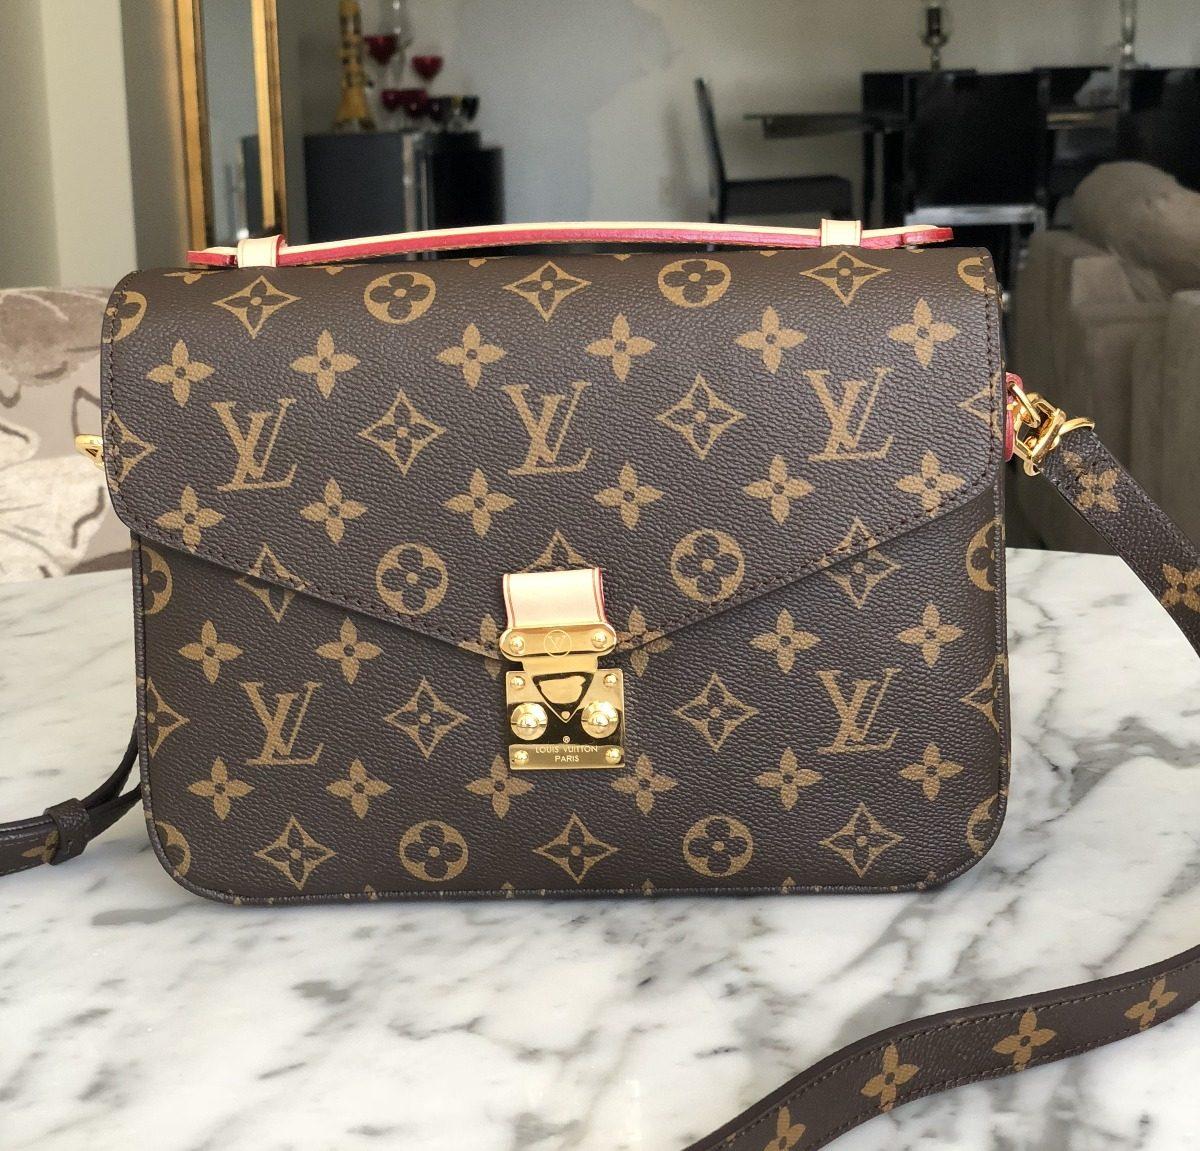 470135fc468 Bolsa Louis Vuitton Pochette Metis Original Fotos Reais - R  1.899 ...